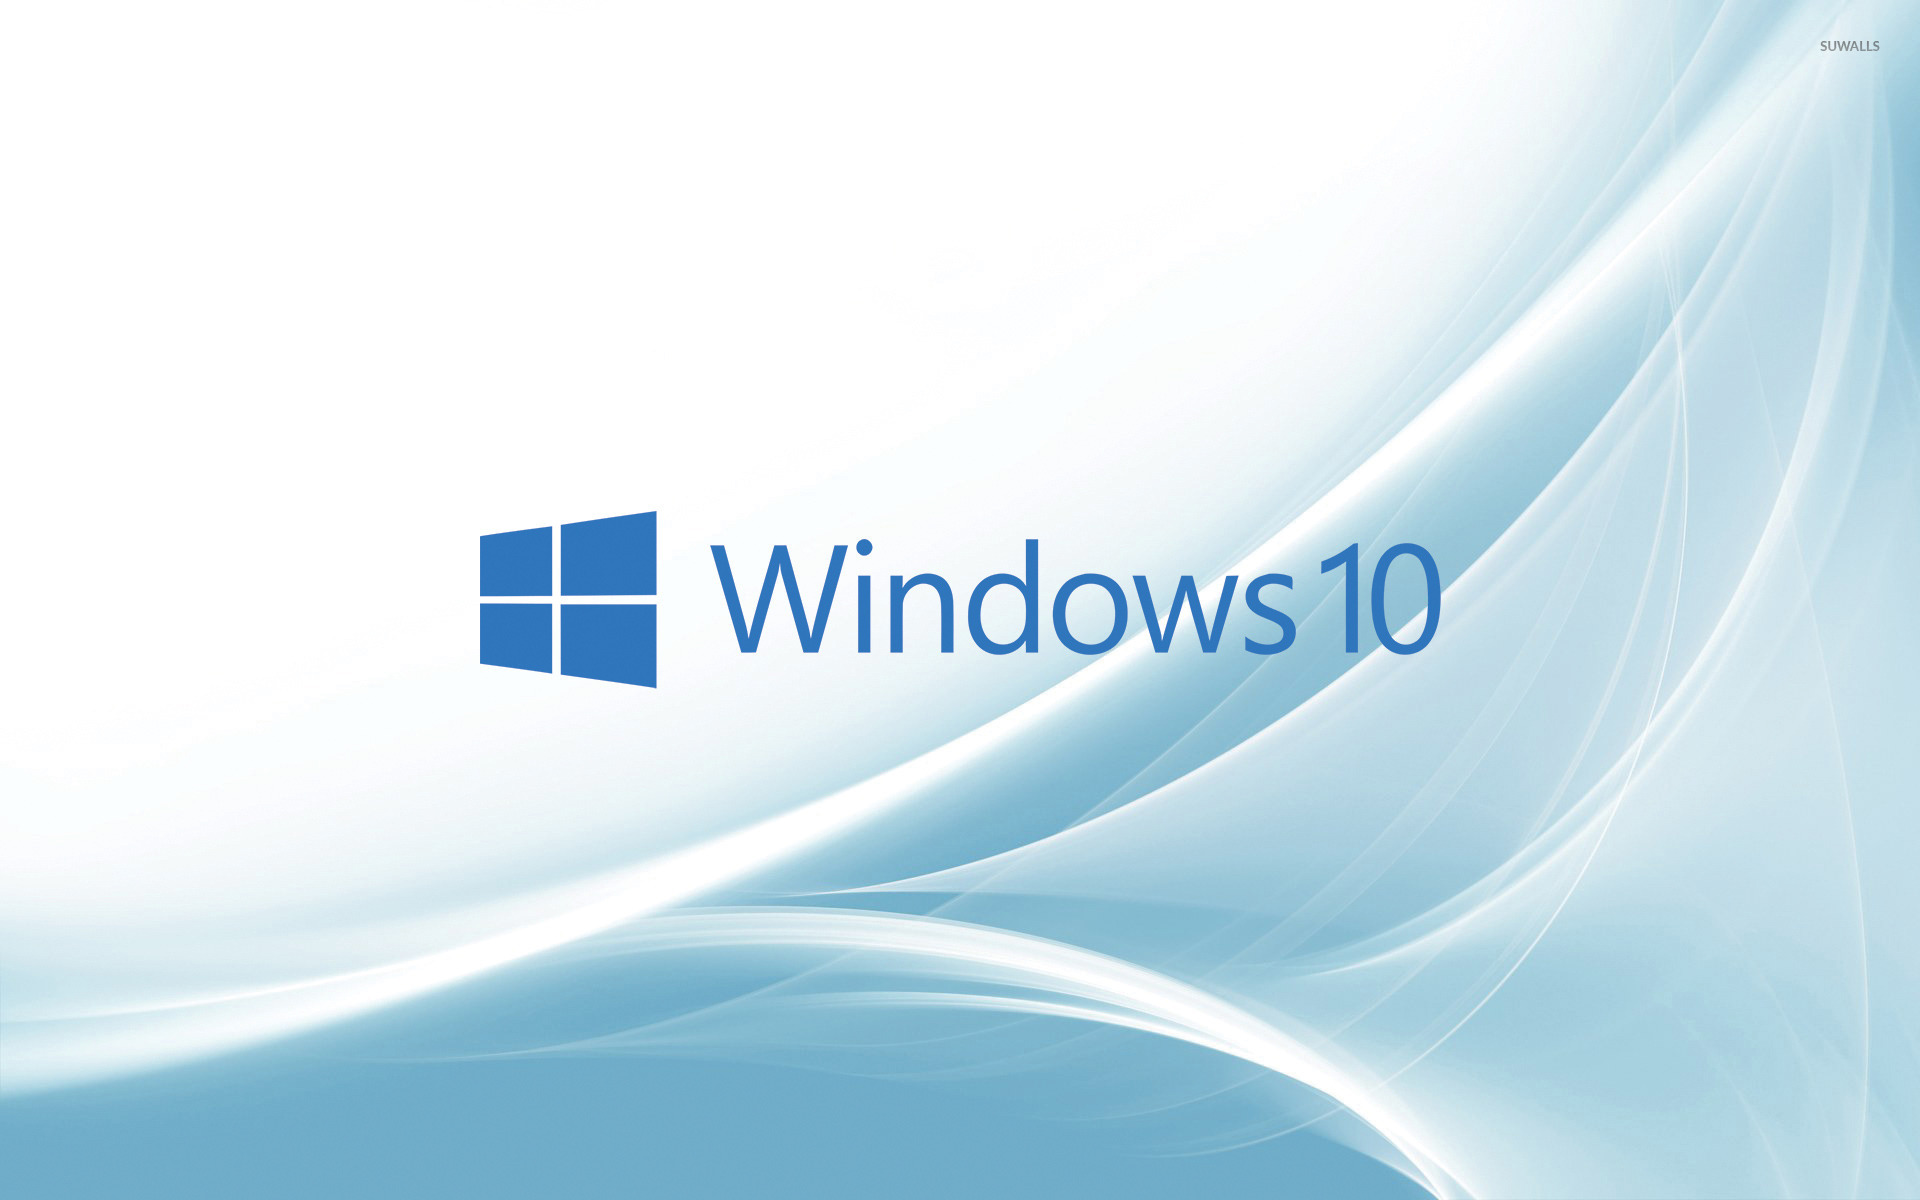 Windows 10 wallpaper - Computer wallpapers - #46487